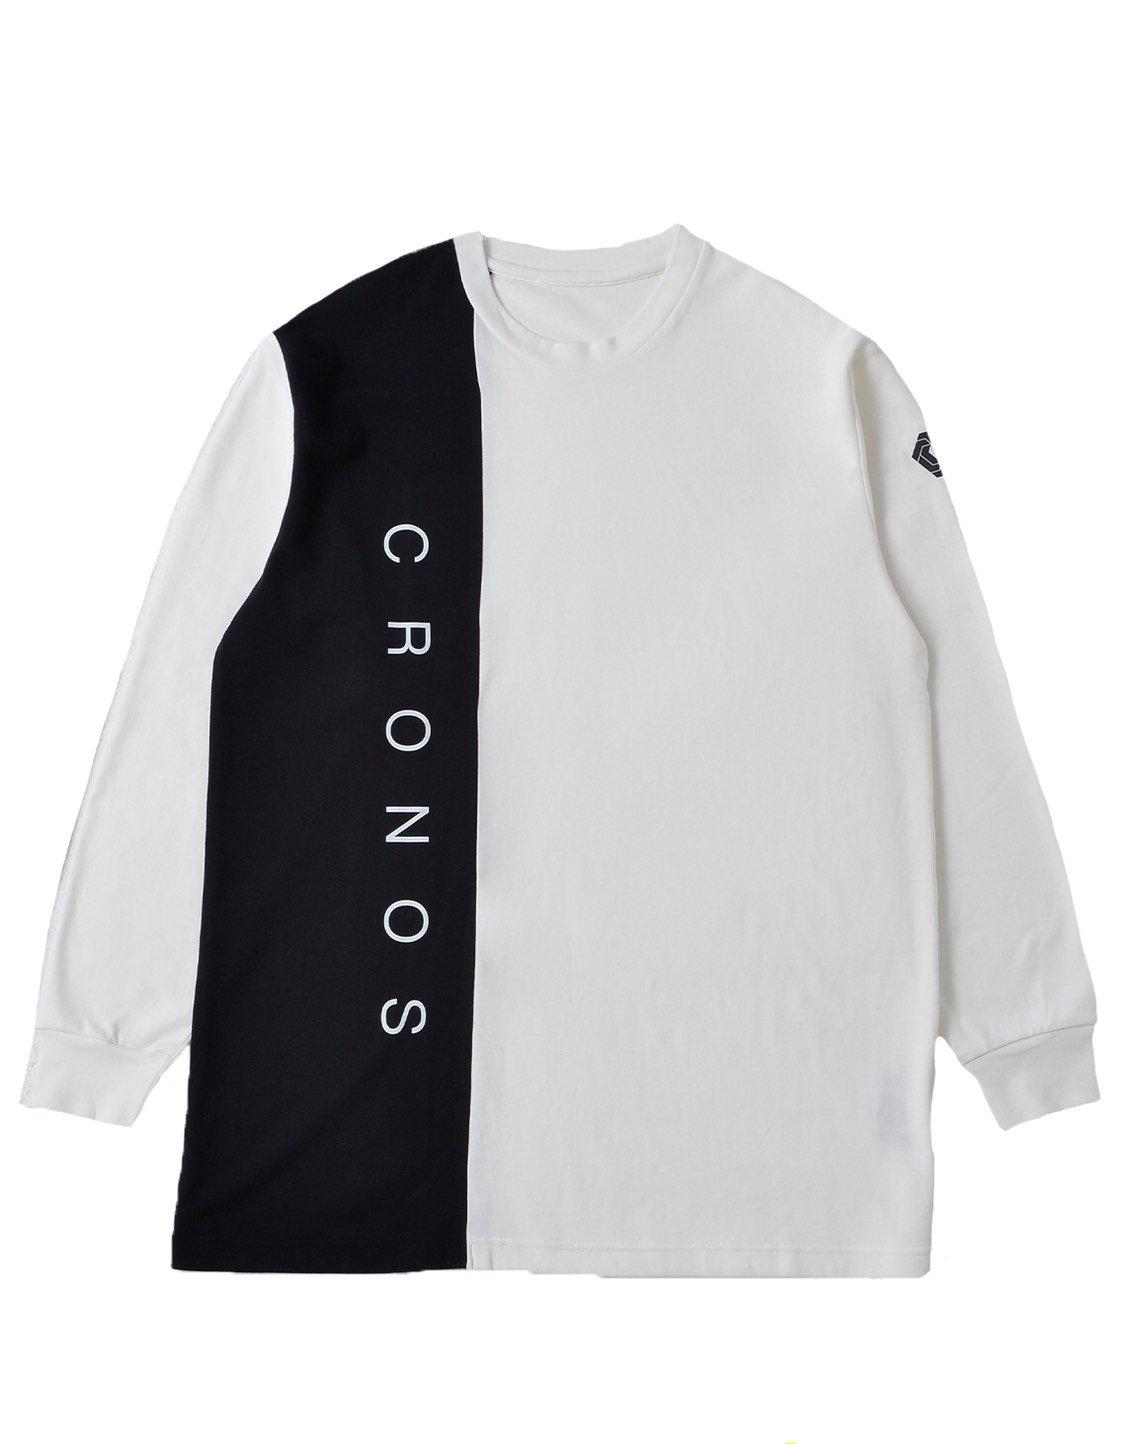 CRONOS RIGHT SIDE LINE LONGSLEEVE【WHITE】